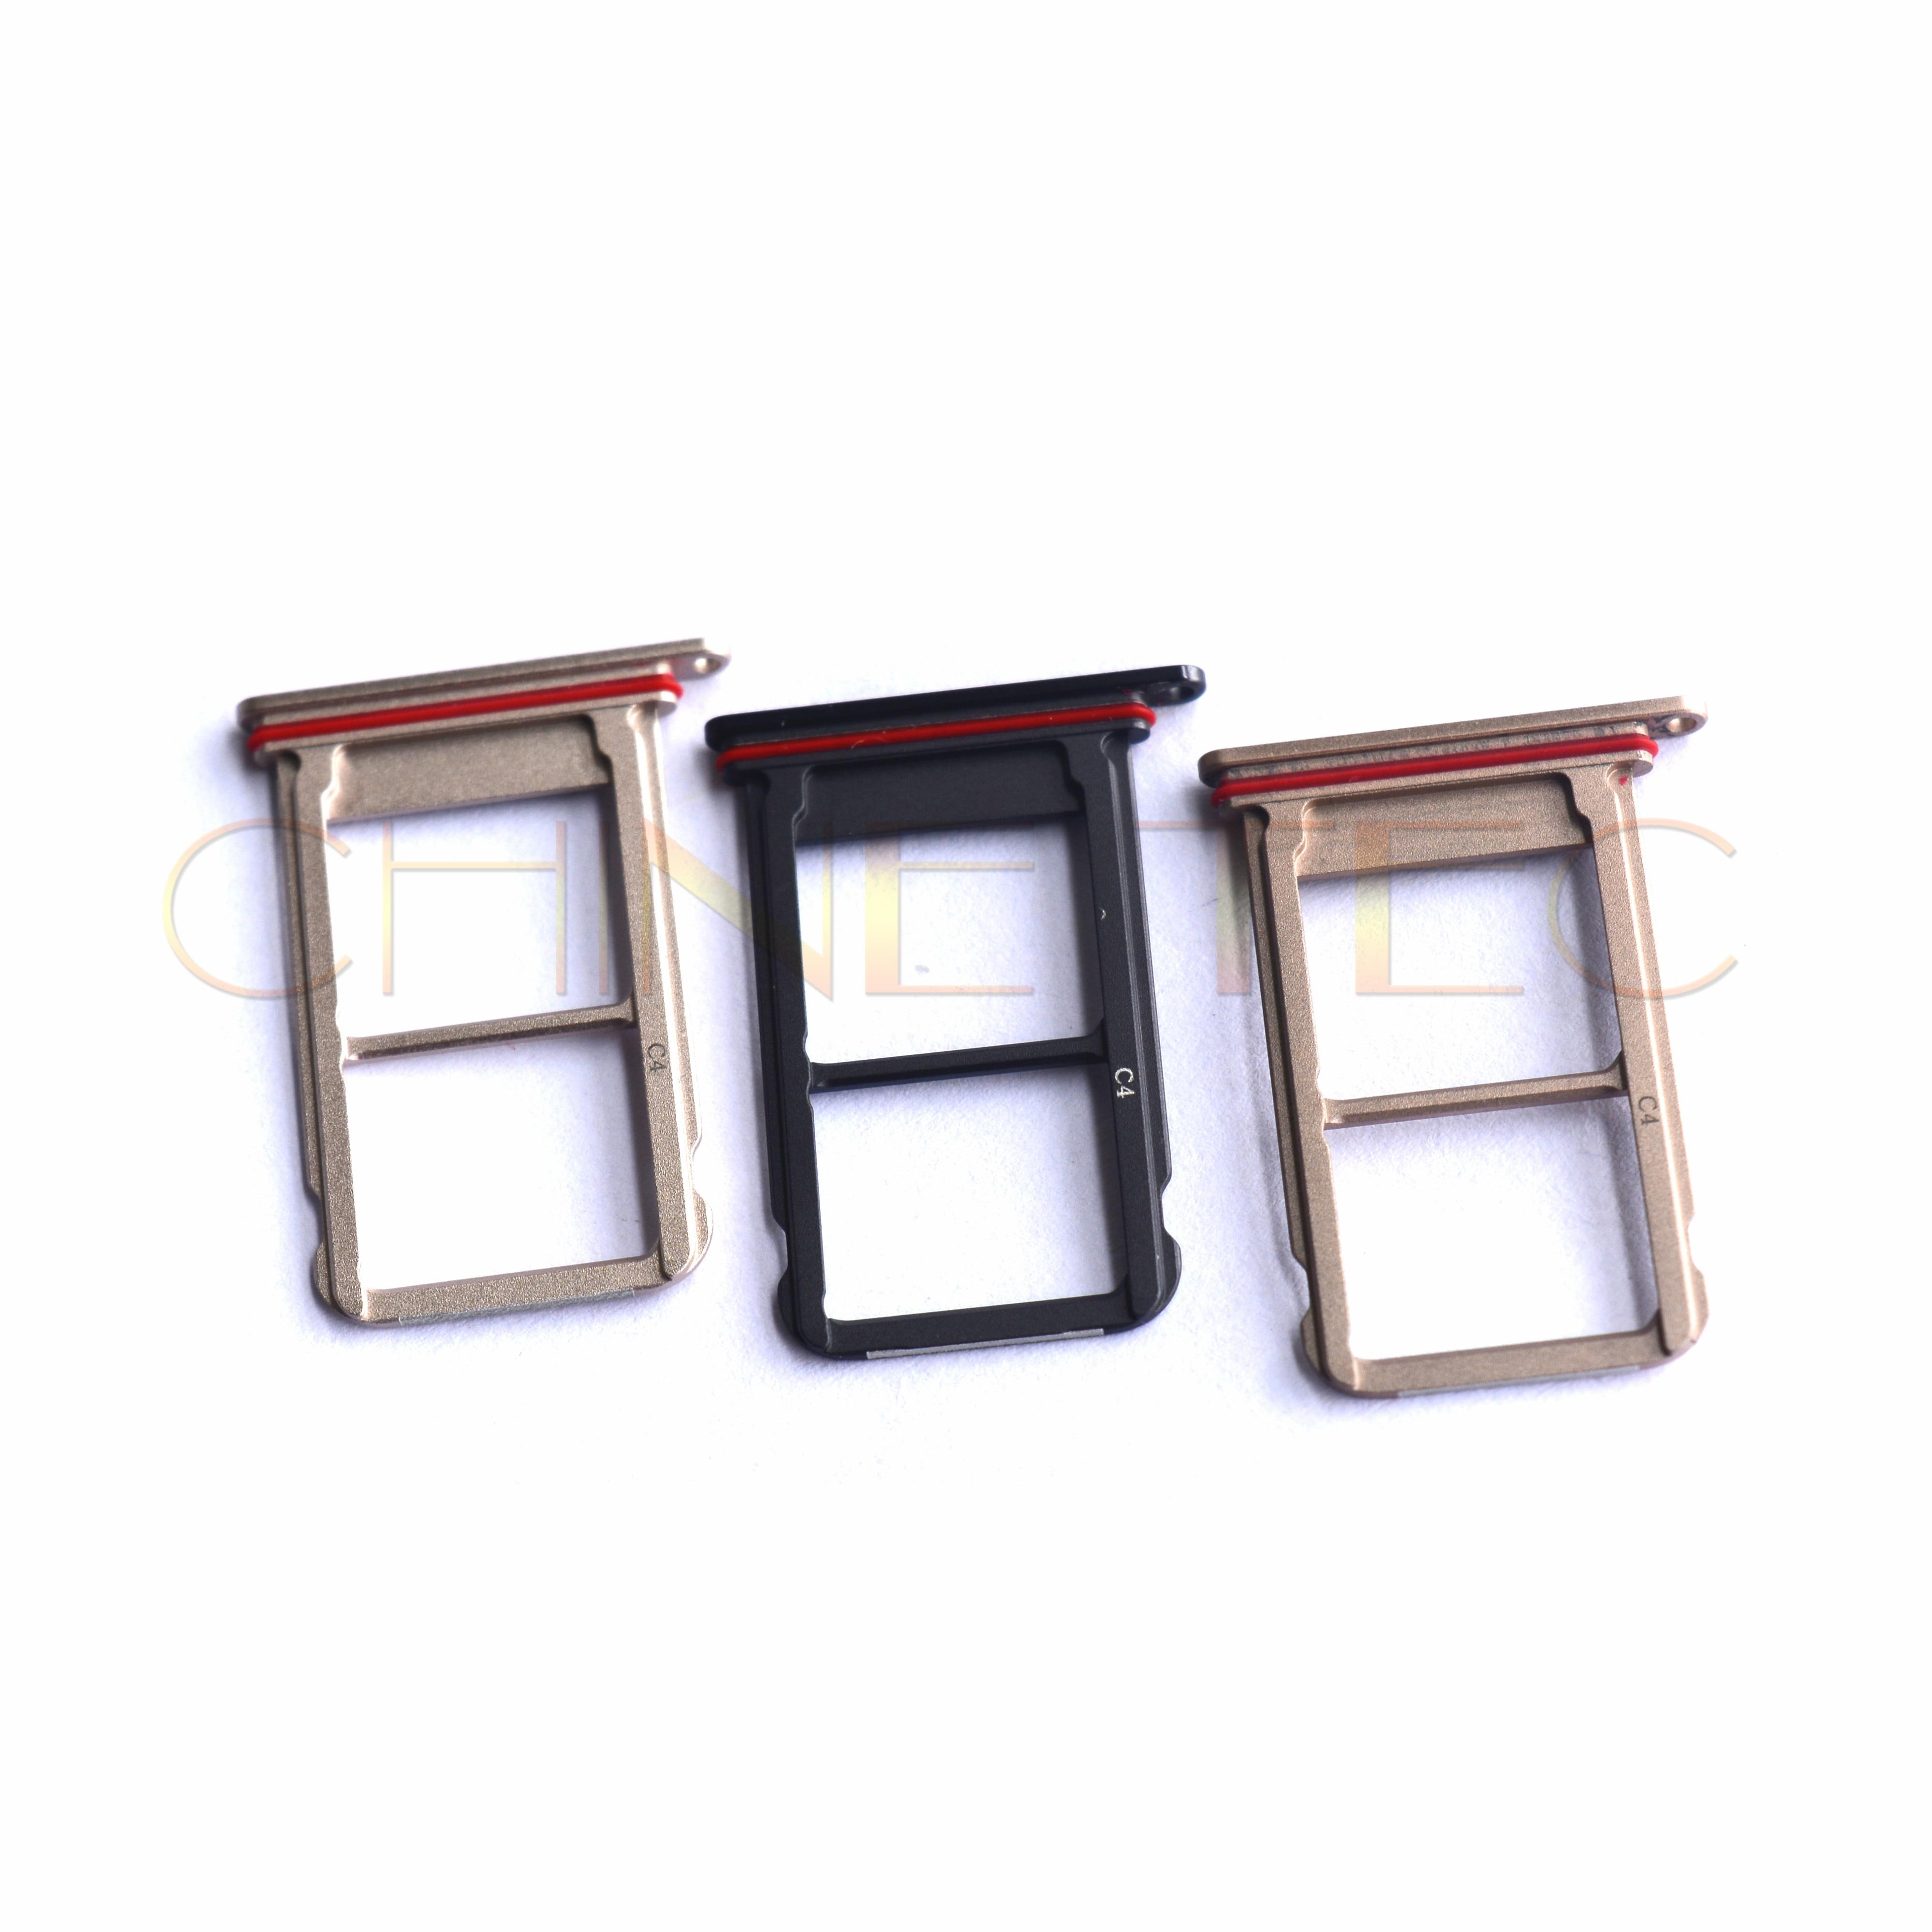 10pcs Nano SIM/ Micro SIM Card reader Tray Holder Micro SD Card Slot Holder Adapter for Huawei Ascend mate 10 pro